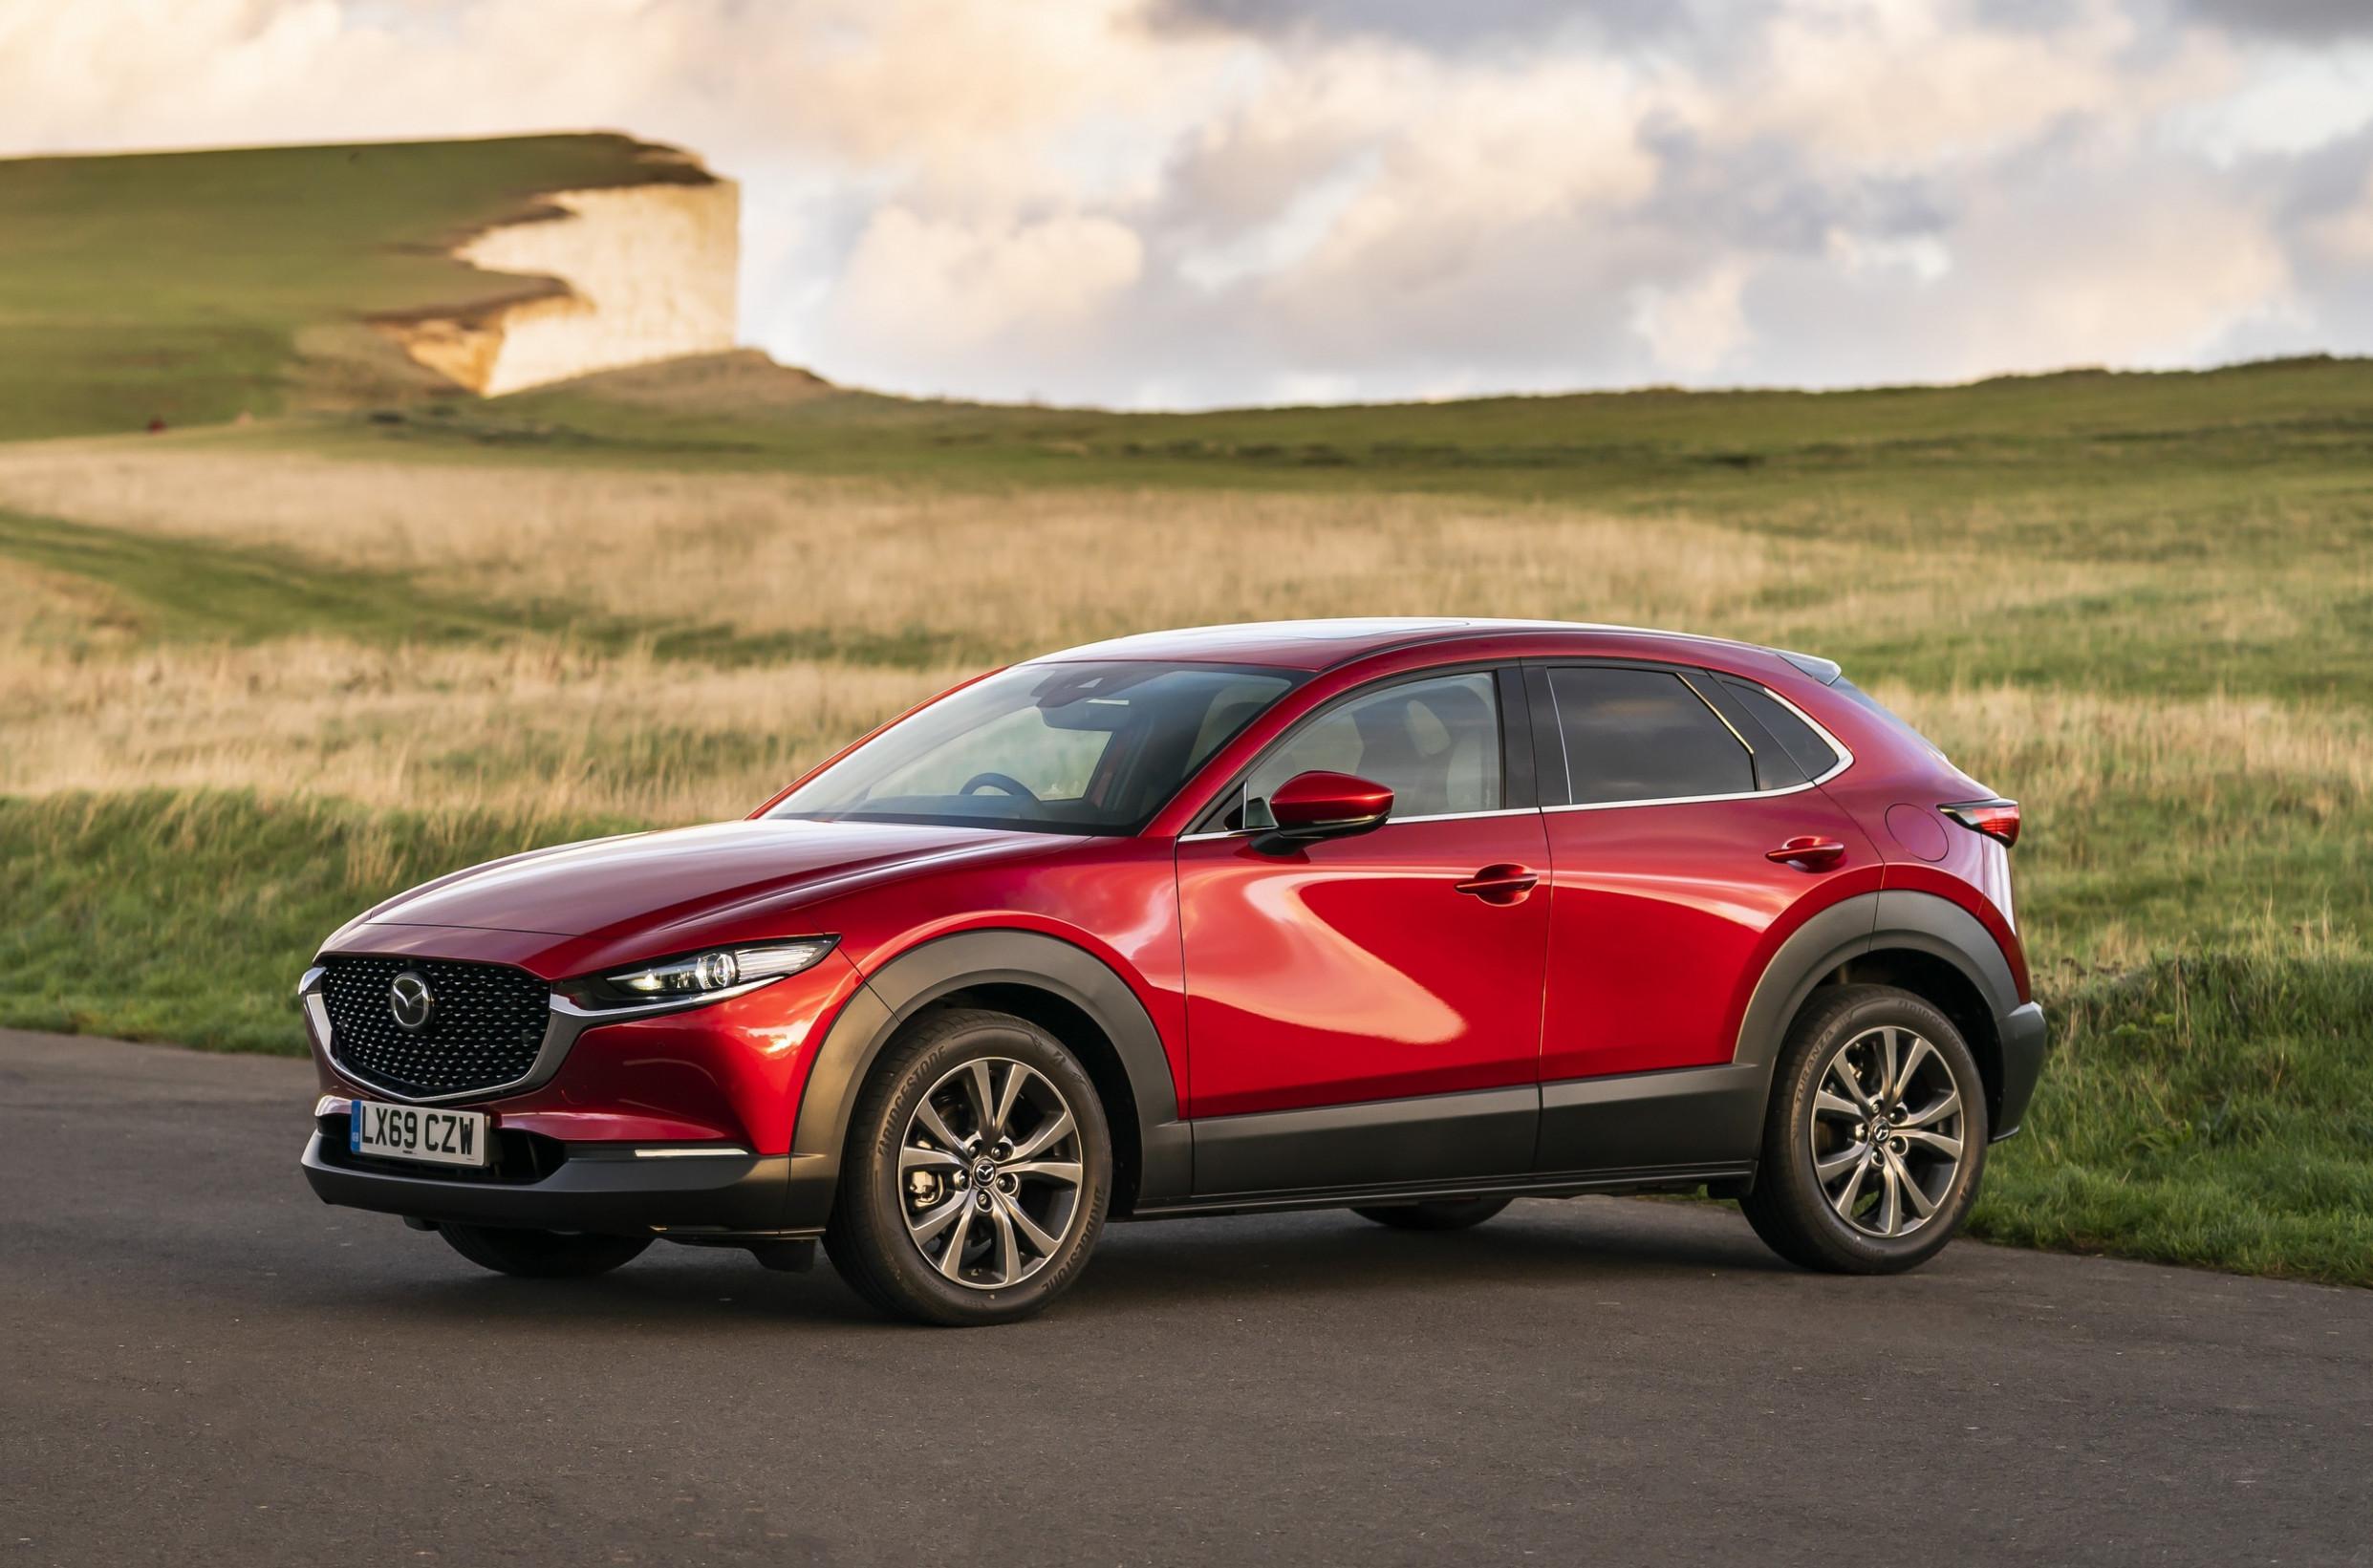 Pricing Mazda Cx5 Grand Touring Lx 2022